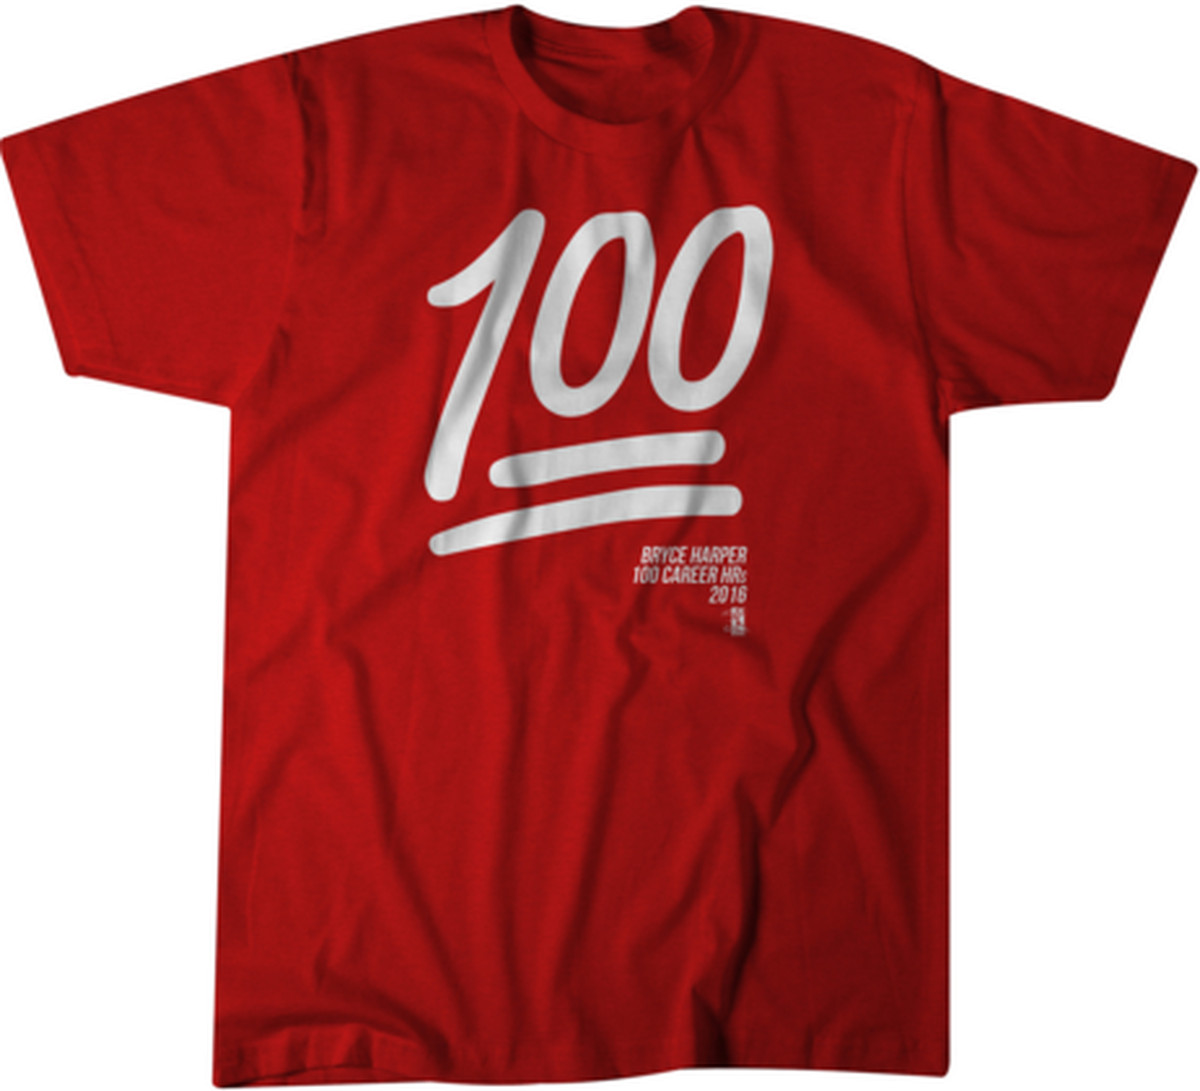 Bryce harper 100 home runs emoji t shirt available for Bryce harper mvp shirt